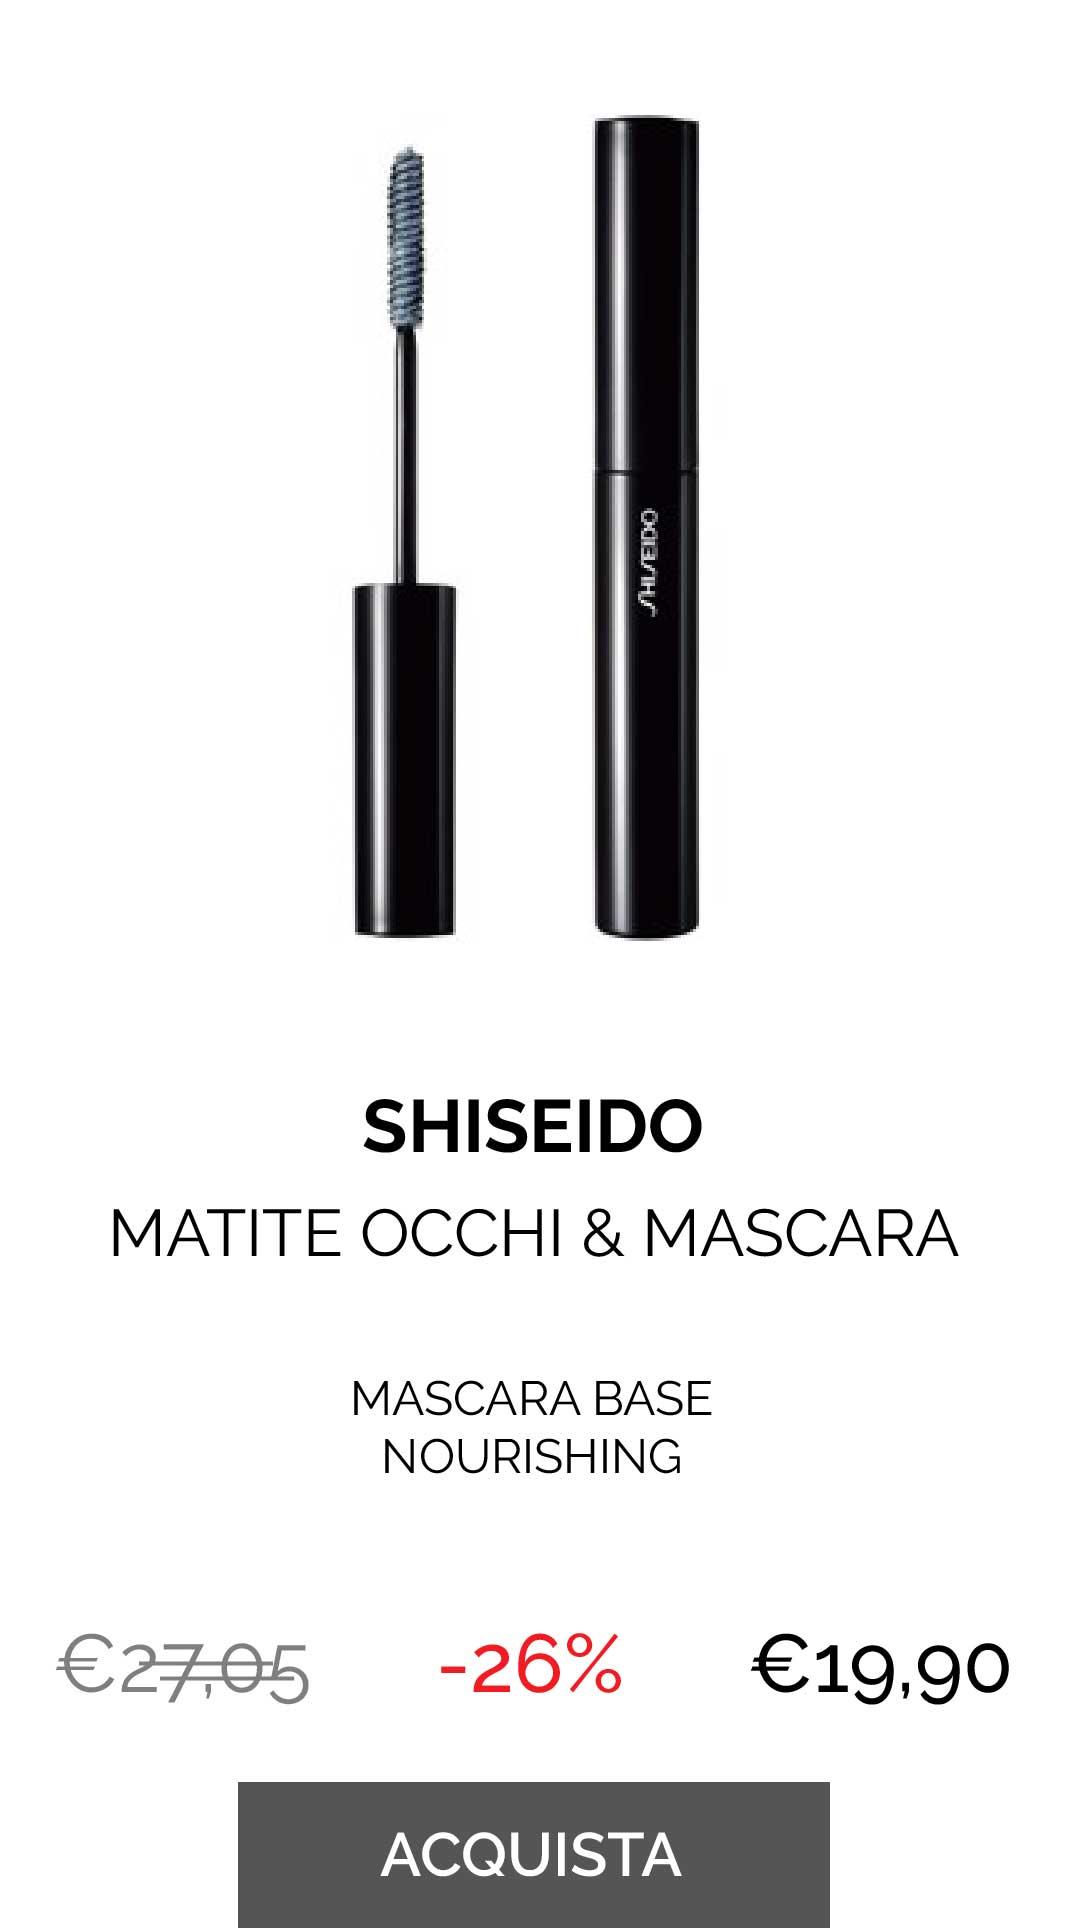 SHISEIDO - MASCARA BASE NOURISHING